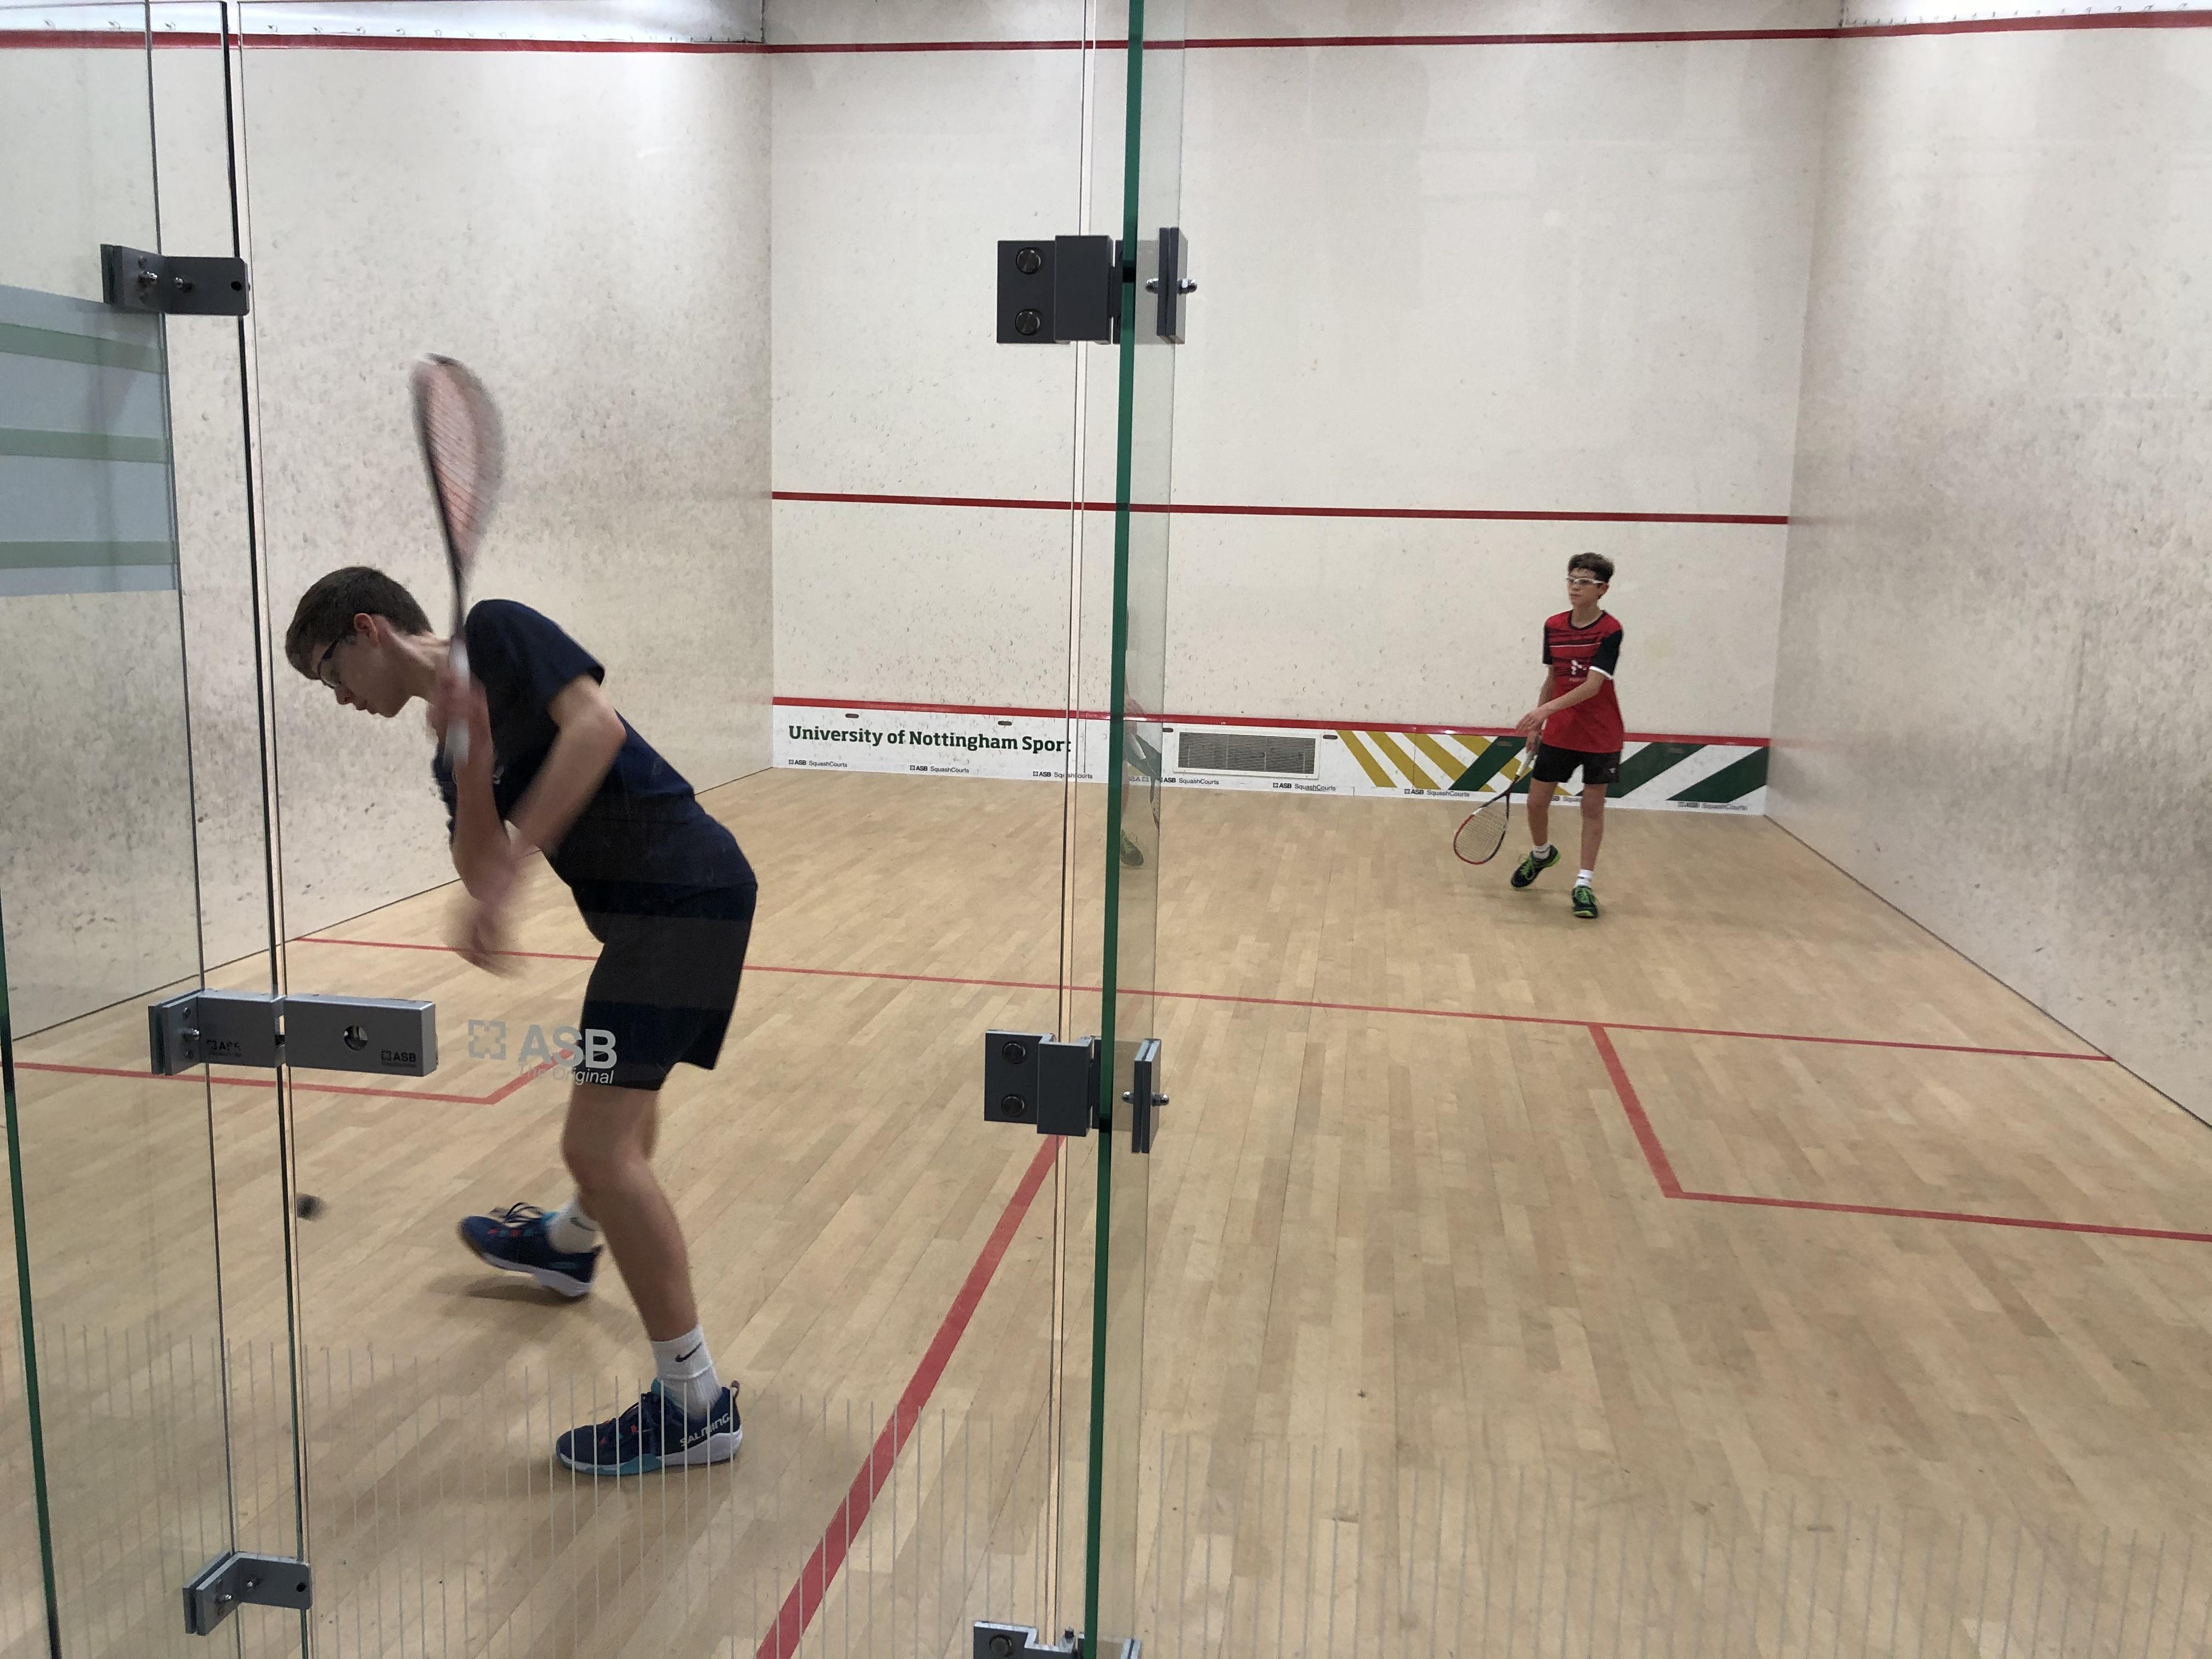 Report: James Carman at the Junior British Championships